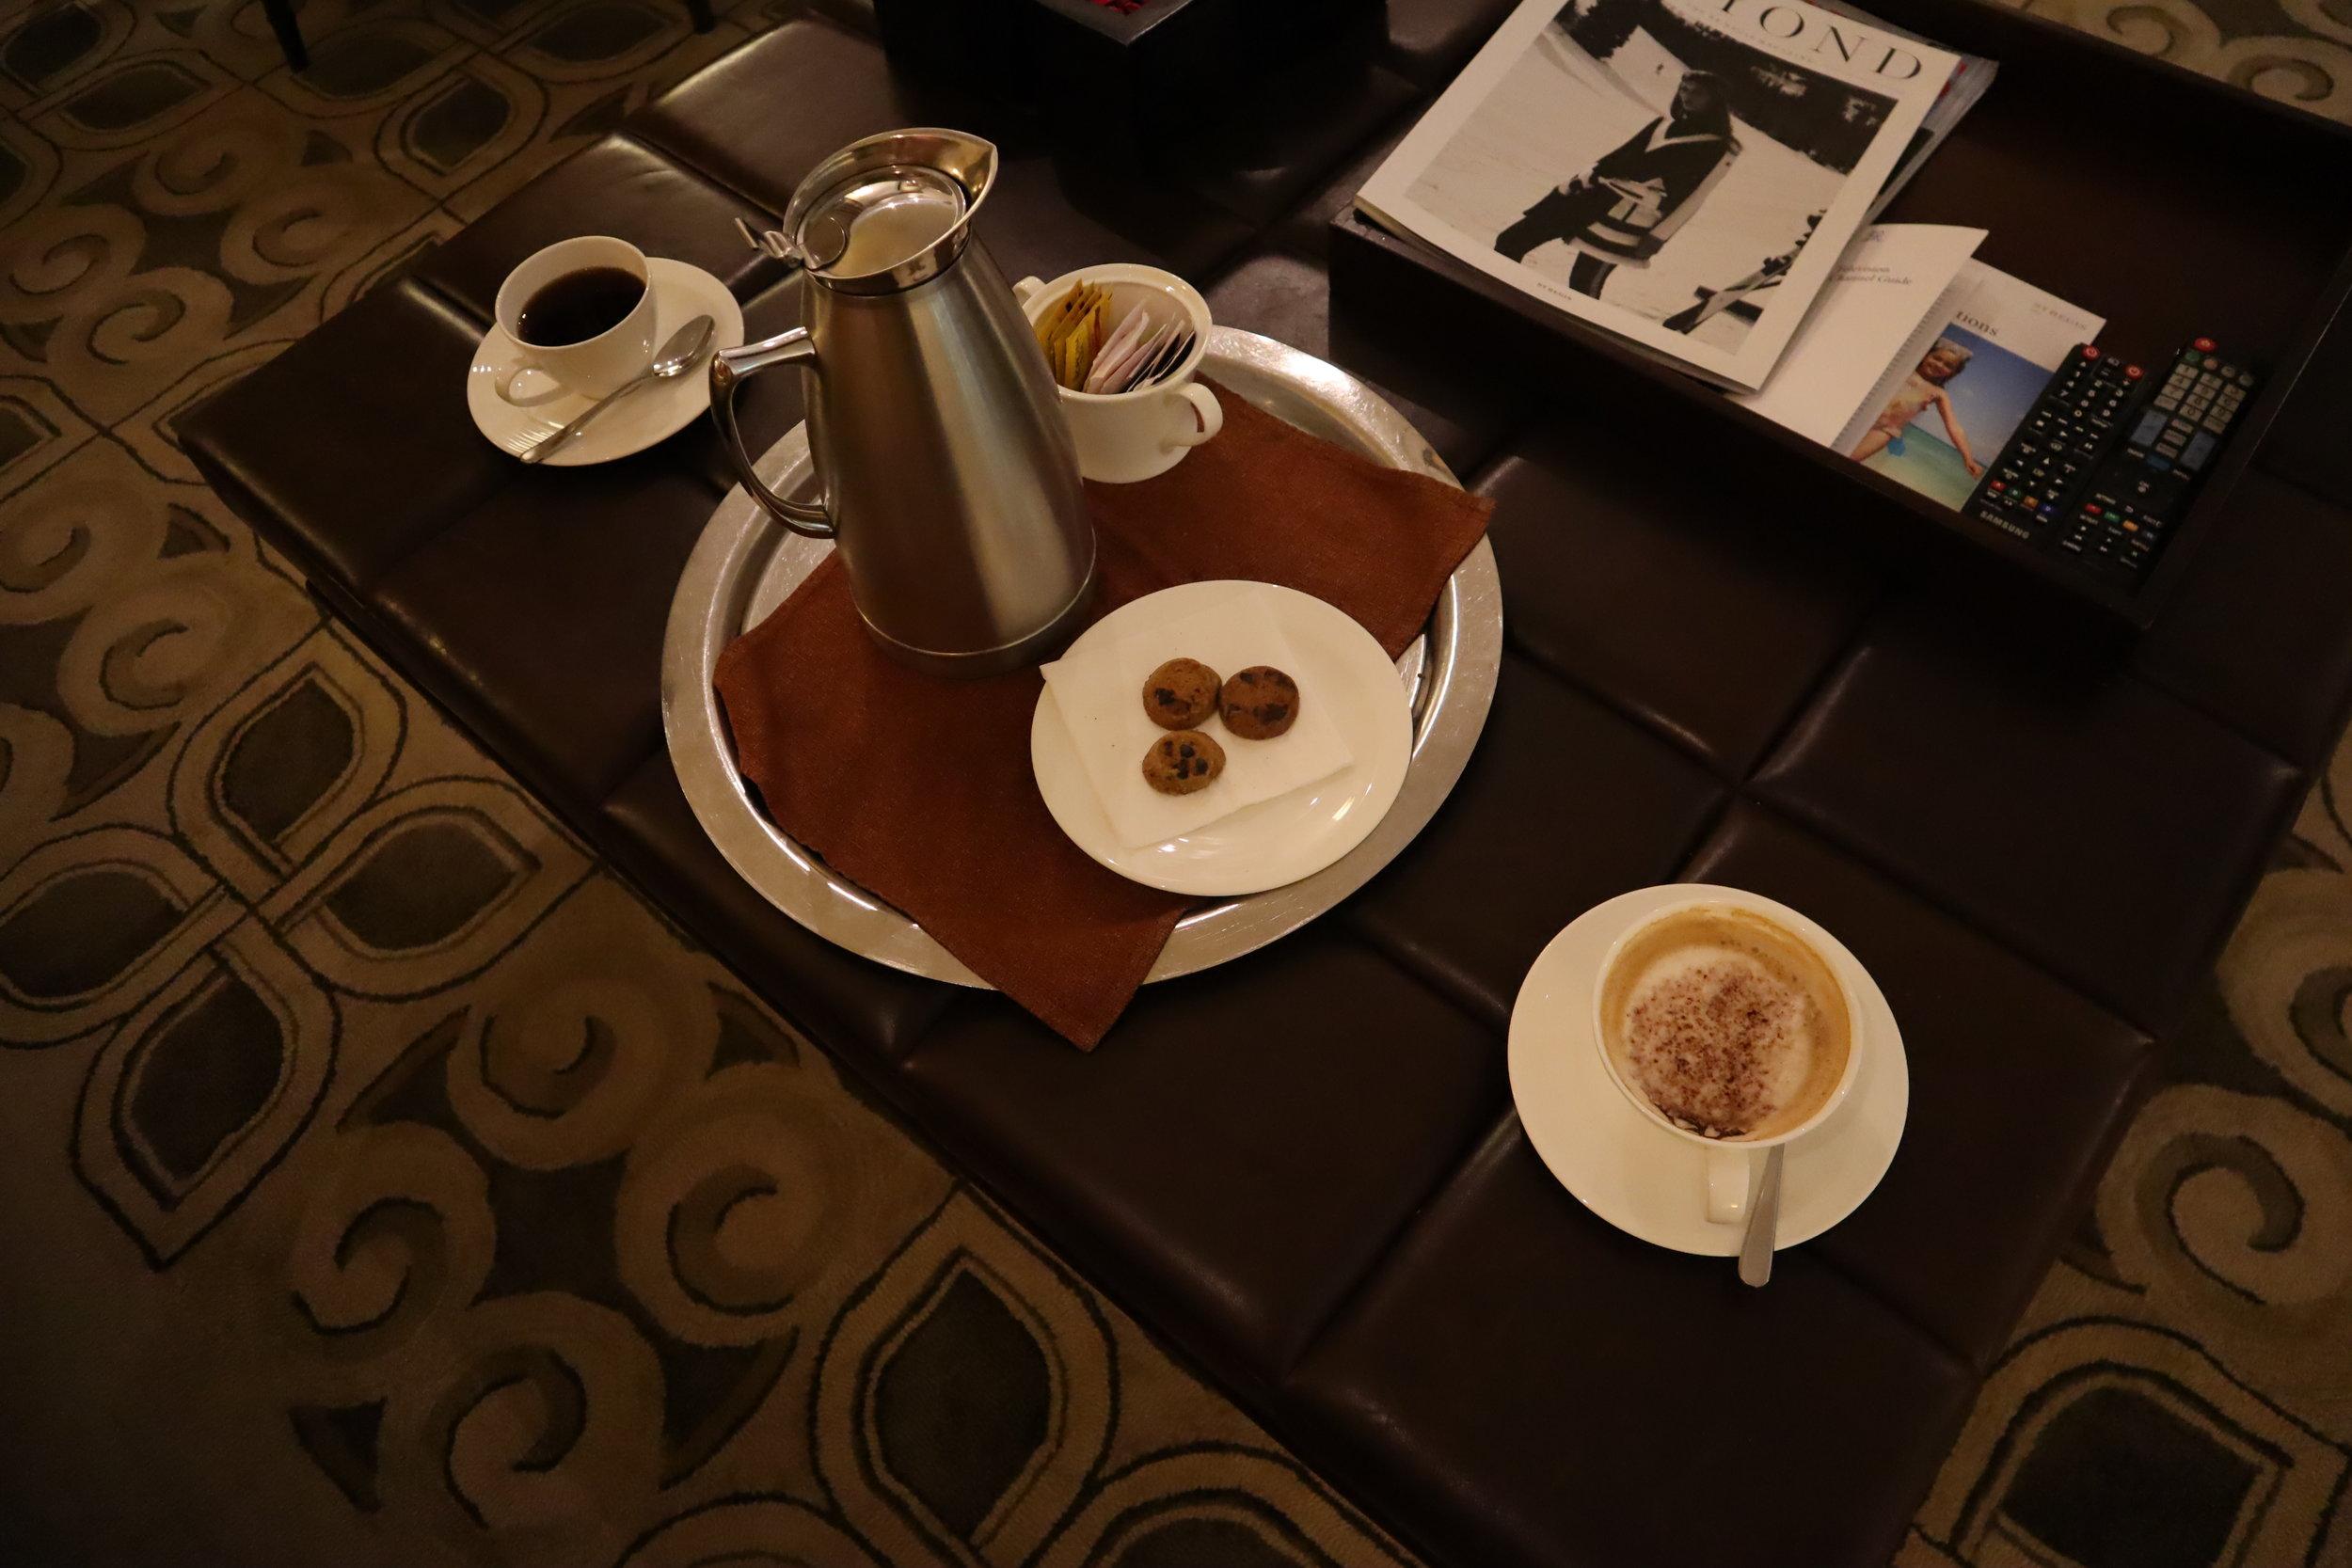 St. Regis Bali – Coffee via butler service